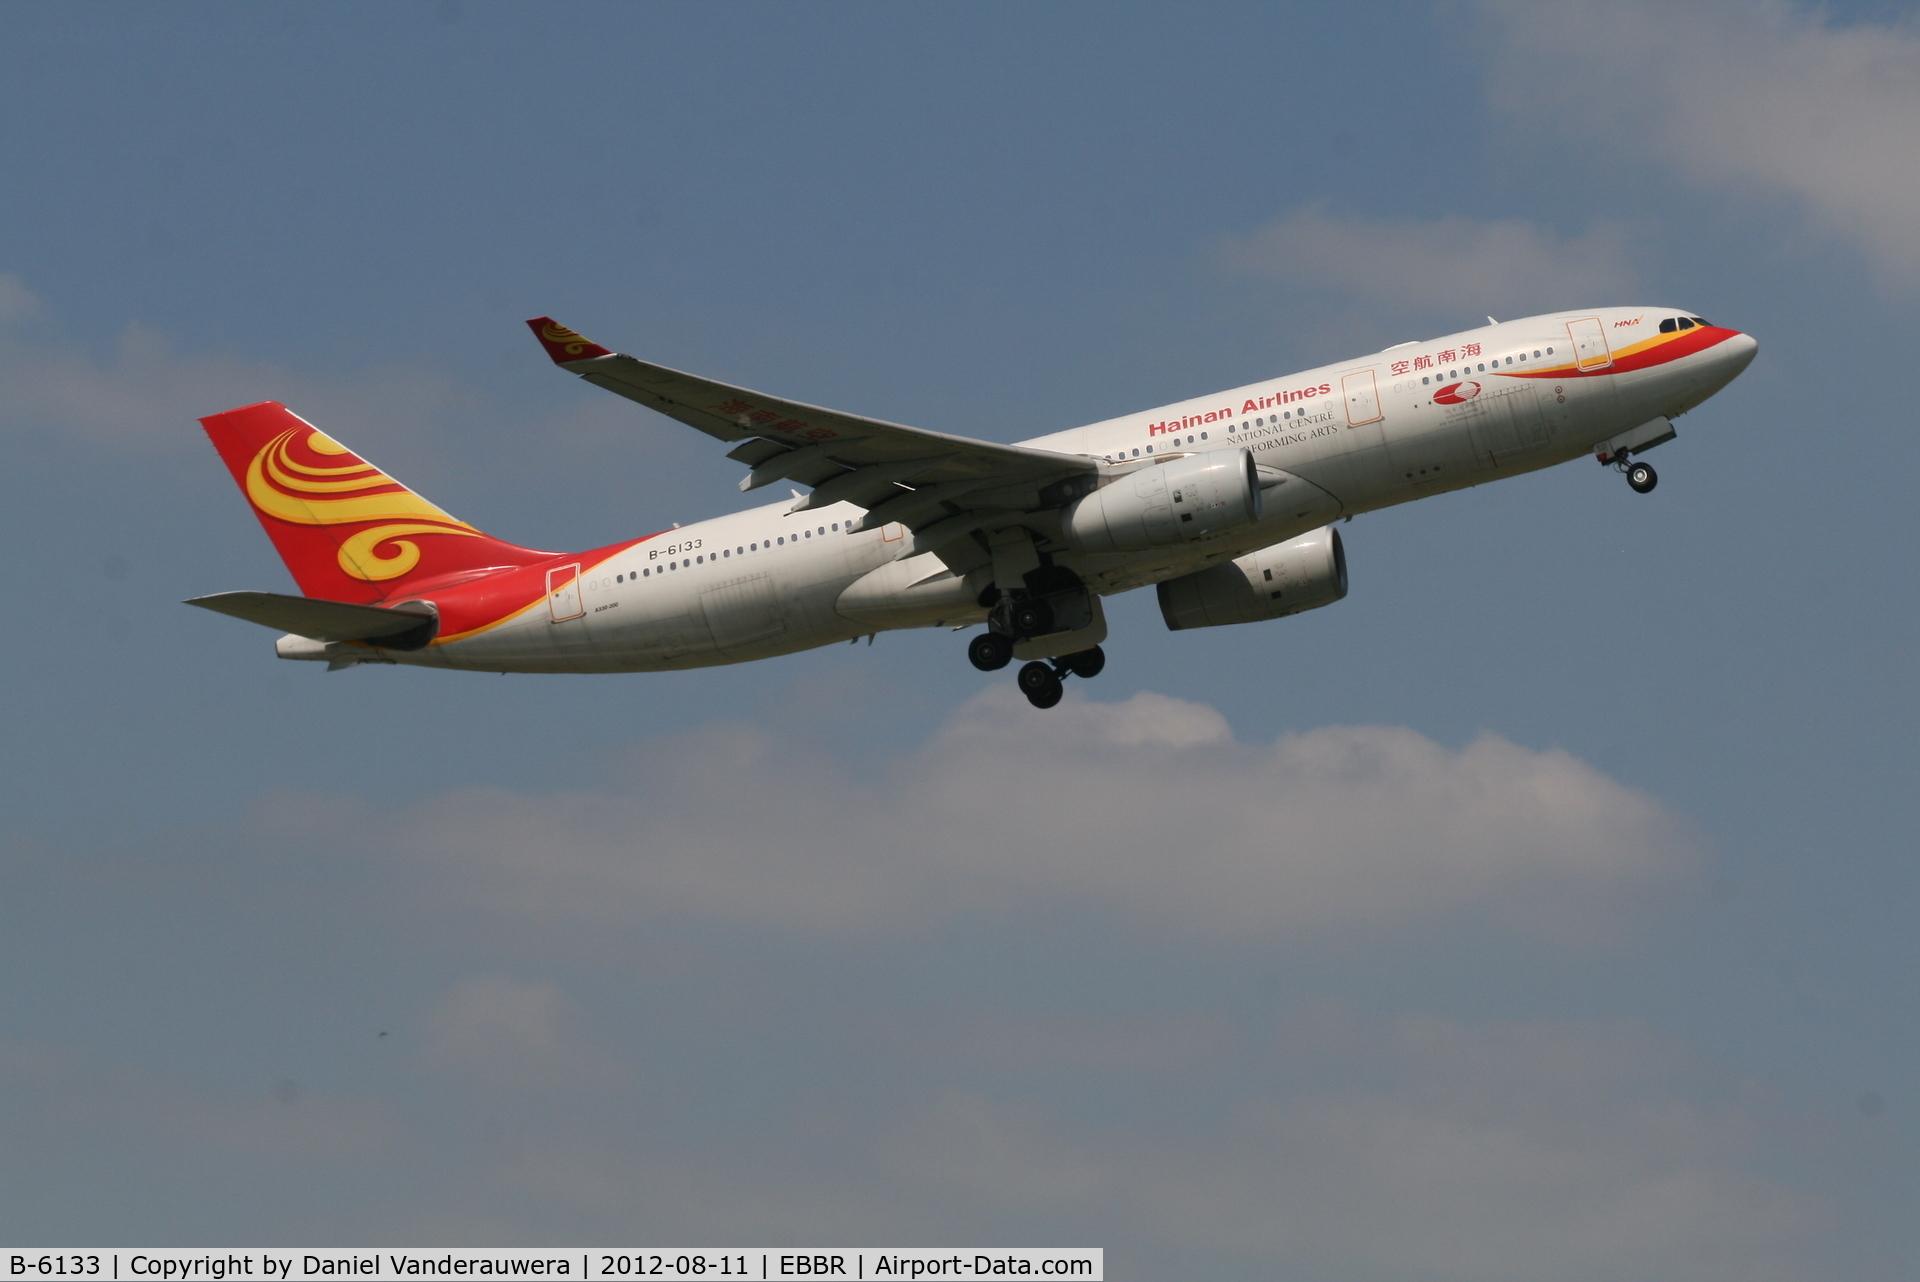 B-6133, 2009 Airbus A330-243 C/N 982, Flight HU492 is climbing from RWY 07R